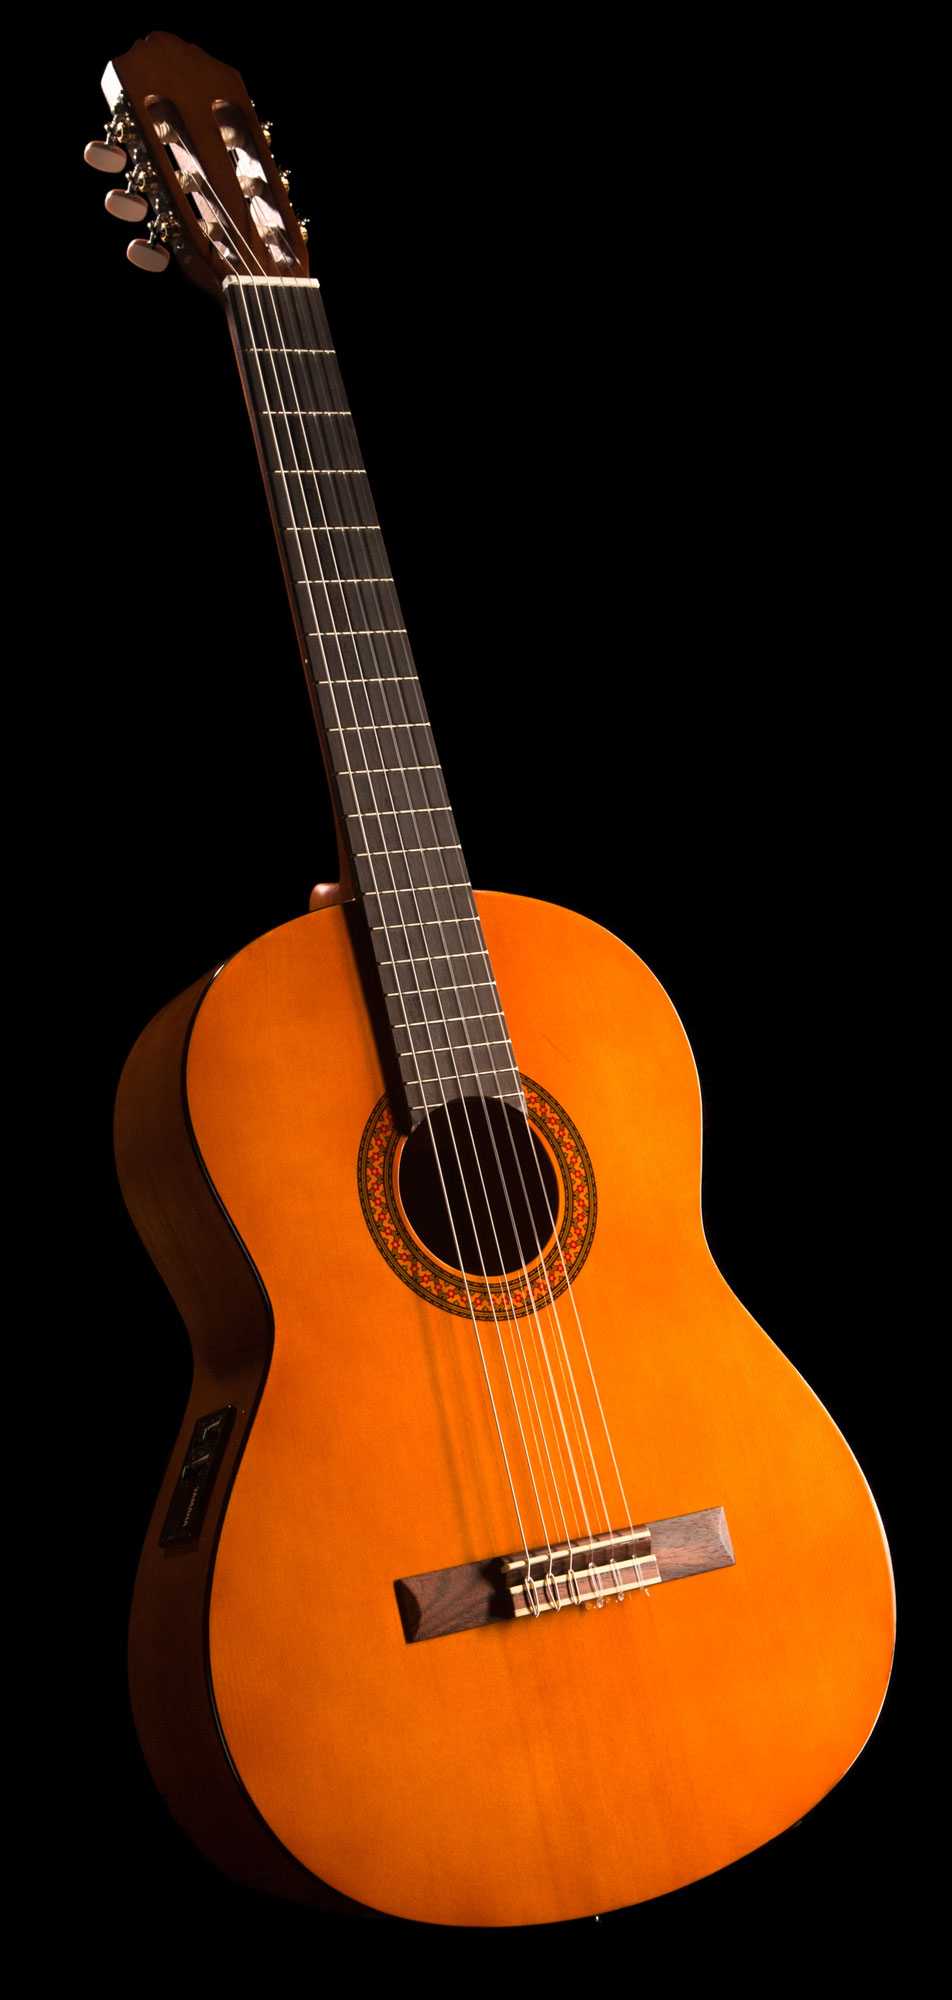 yamaha cx40 mark ii electro classical guitar yamaha music london. Black Bedroom Furniture Sets. Home Design Ideas